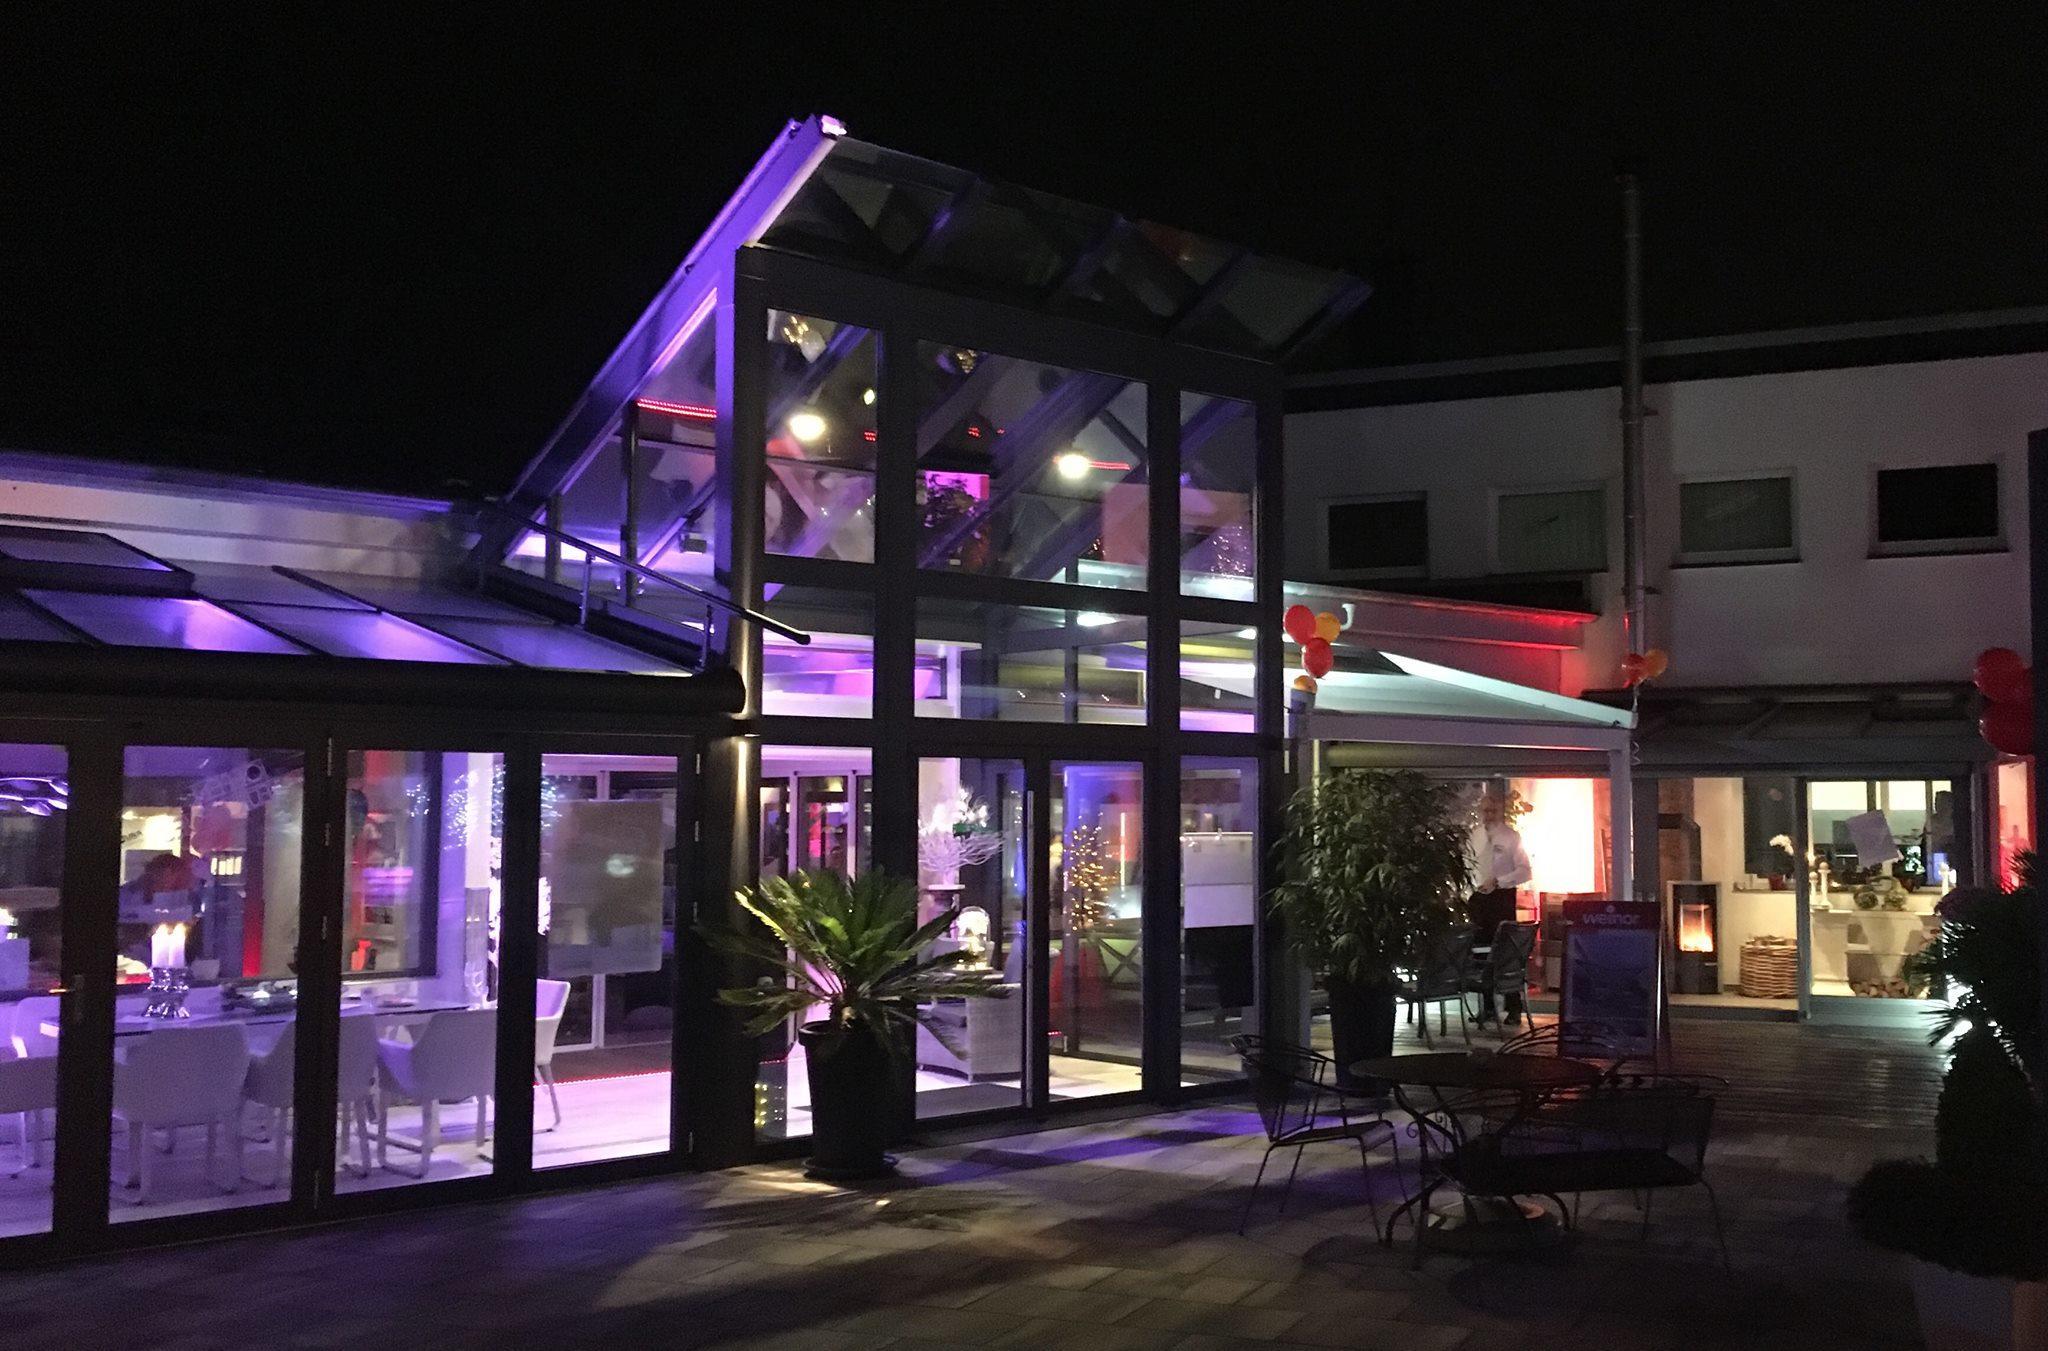 fortuna wintergarten vertriebs gmbh in 40764 langenfeld. Black Bedroom Furniture Sets. Home Design Ideas